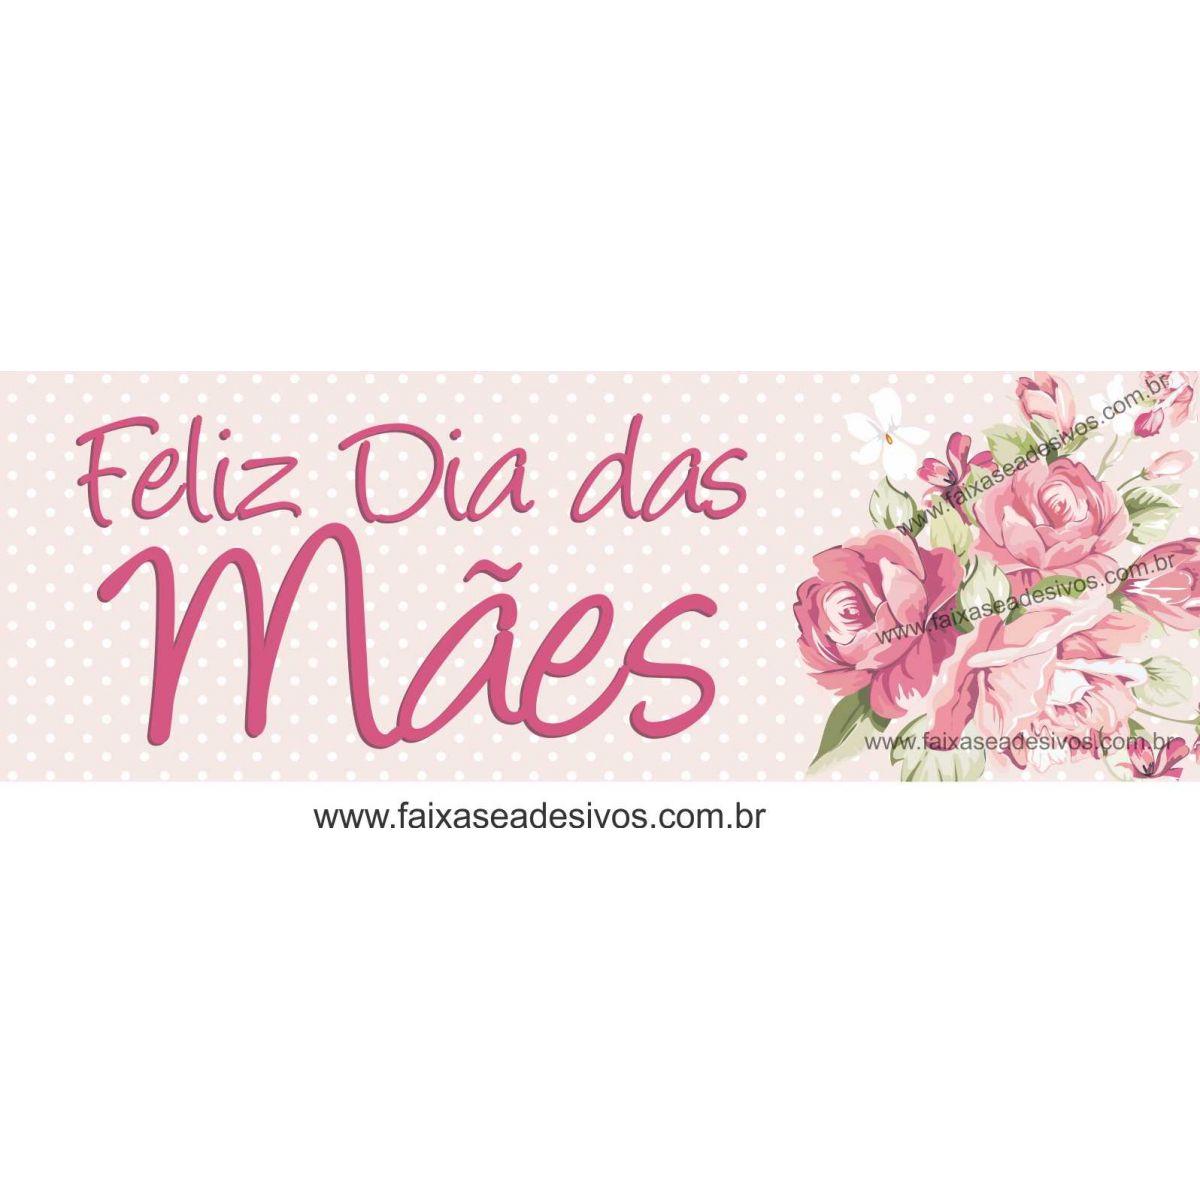 A541M - Adesivo Dia das Mães - Faixa adesiva poá  - Fac Signs